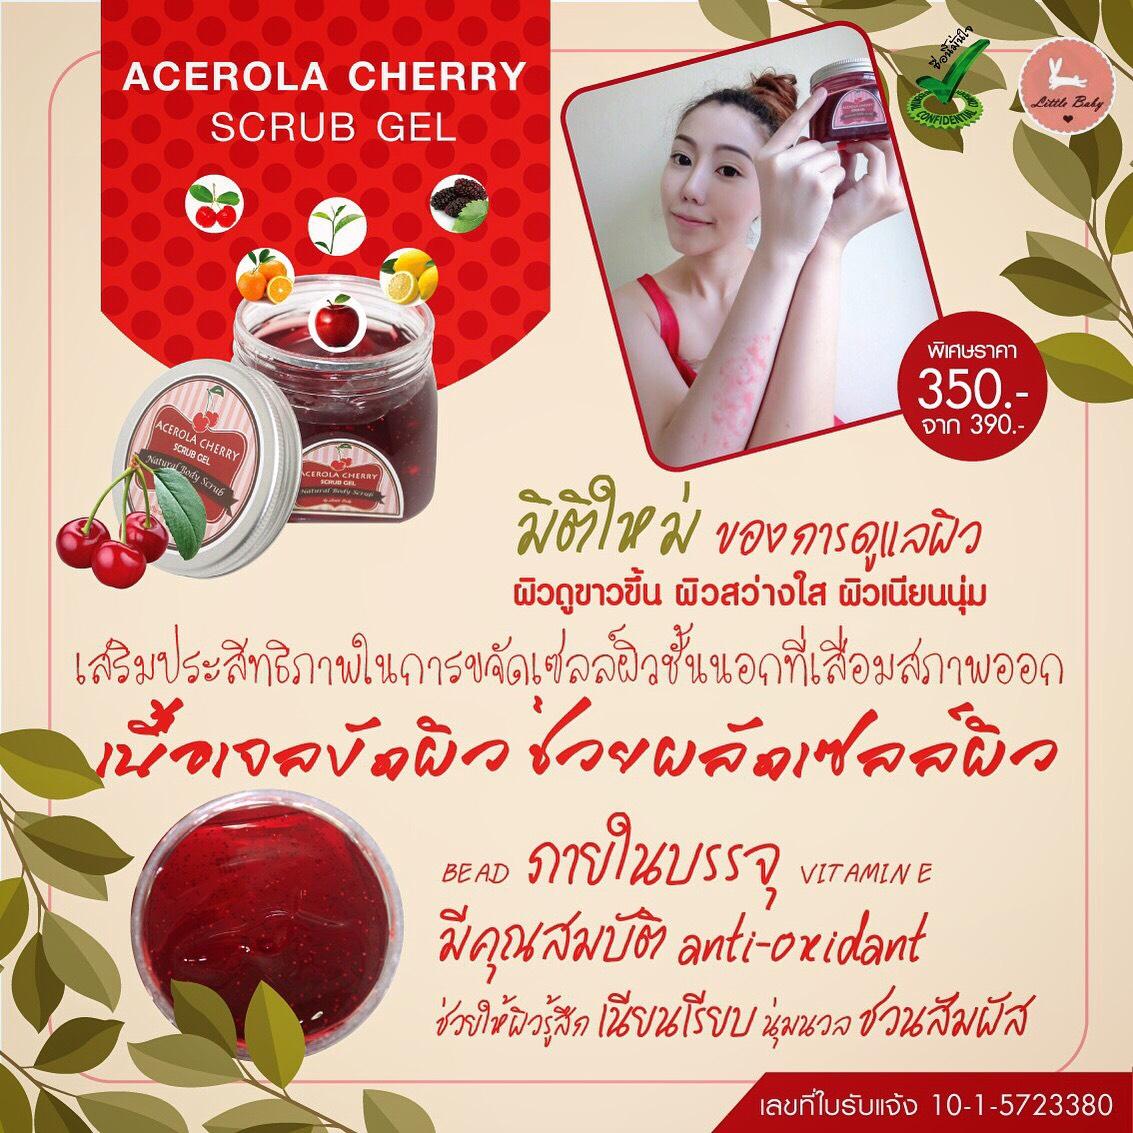 Acerola Cherry Gel Scrub,Cherry,Scrub Gel,Littlebaby,สครับเจล,สคลับเจล,สคลับเชอร์รี่,สคลับเชอรี่,ผิวขาว,สครับผิวขาว,สคลับผิวขาว,ผลัดเซลล์ผิว,ลิตเติ้ลเบบี้